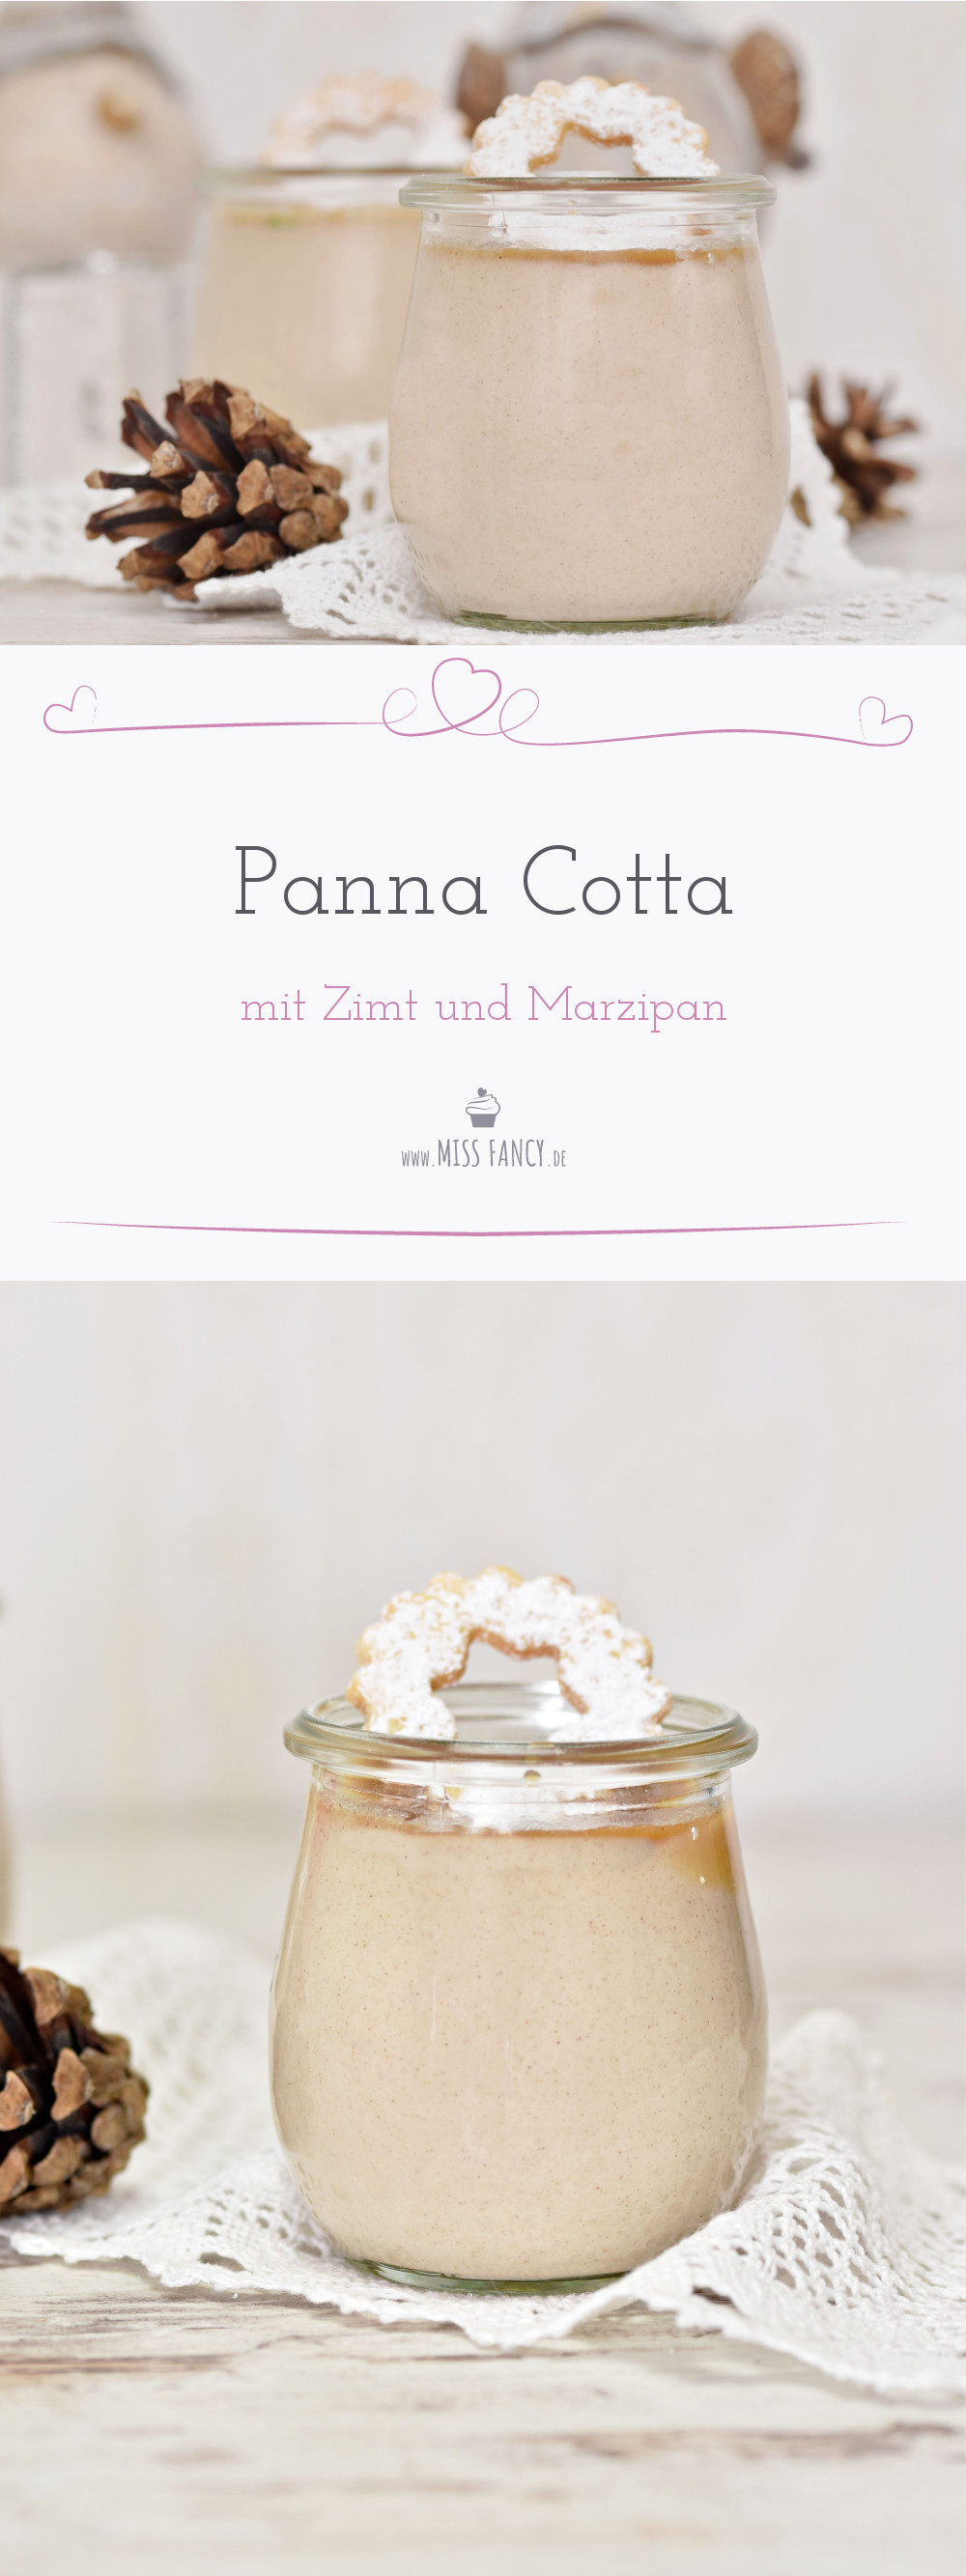 Rezept-Panna-Cotta-Zimt-Marzipan